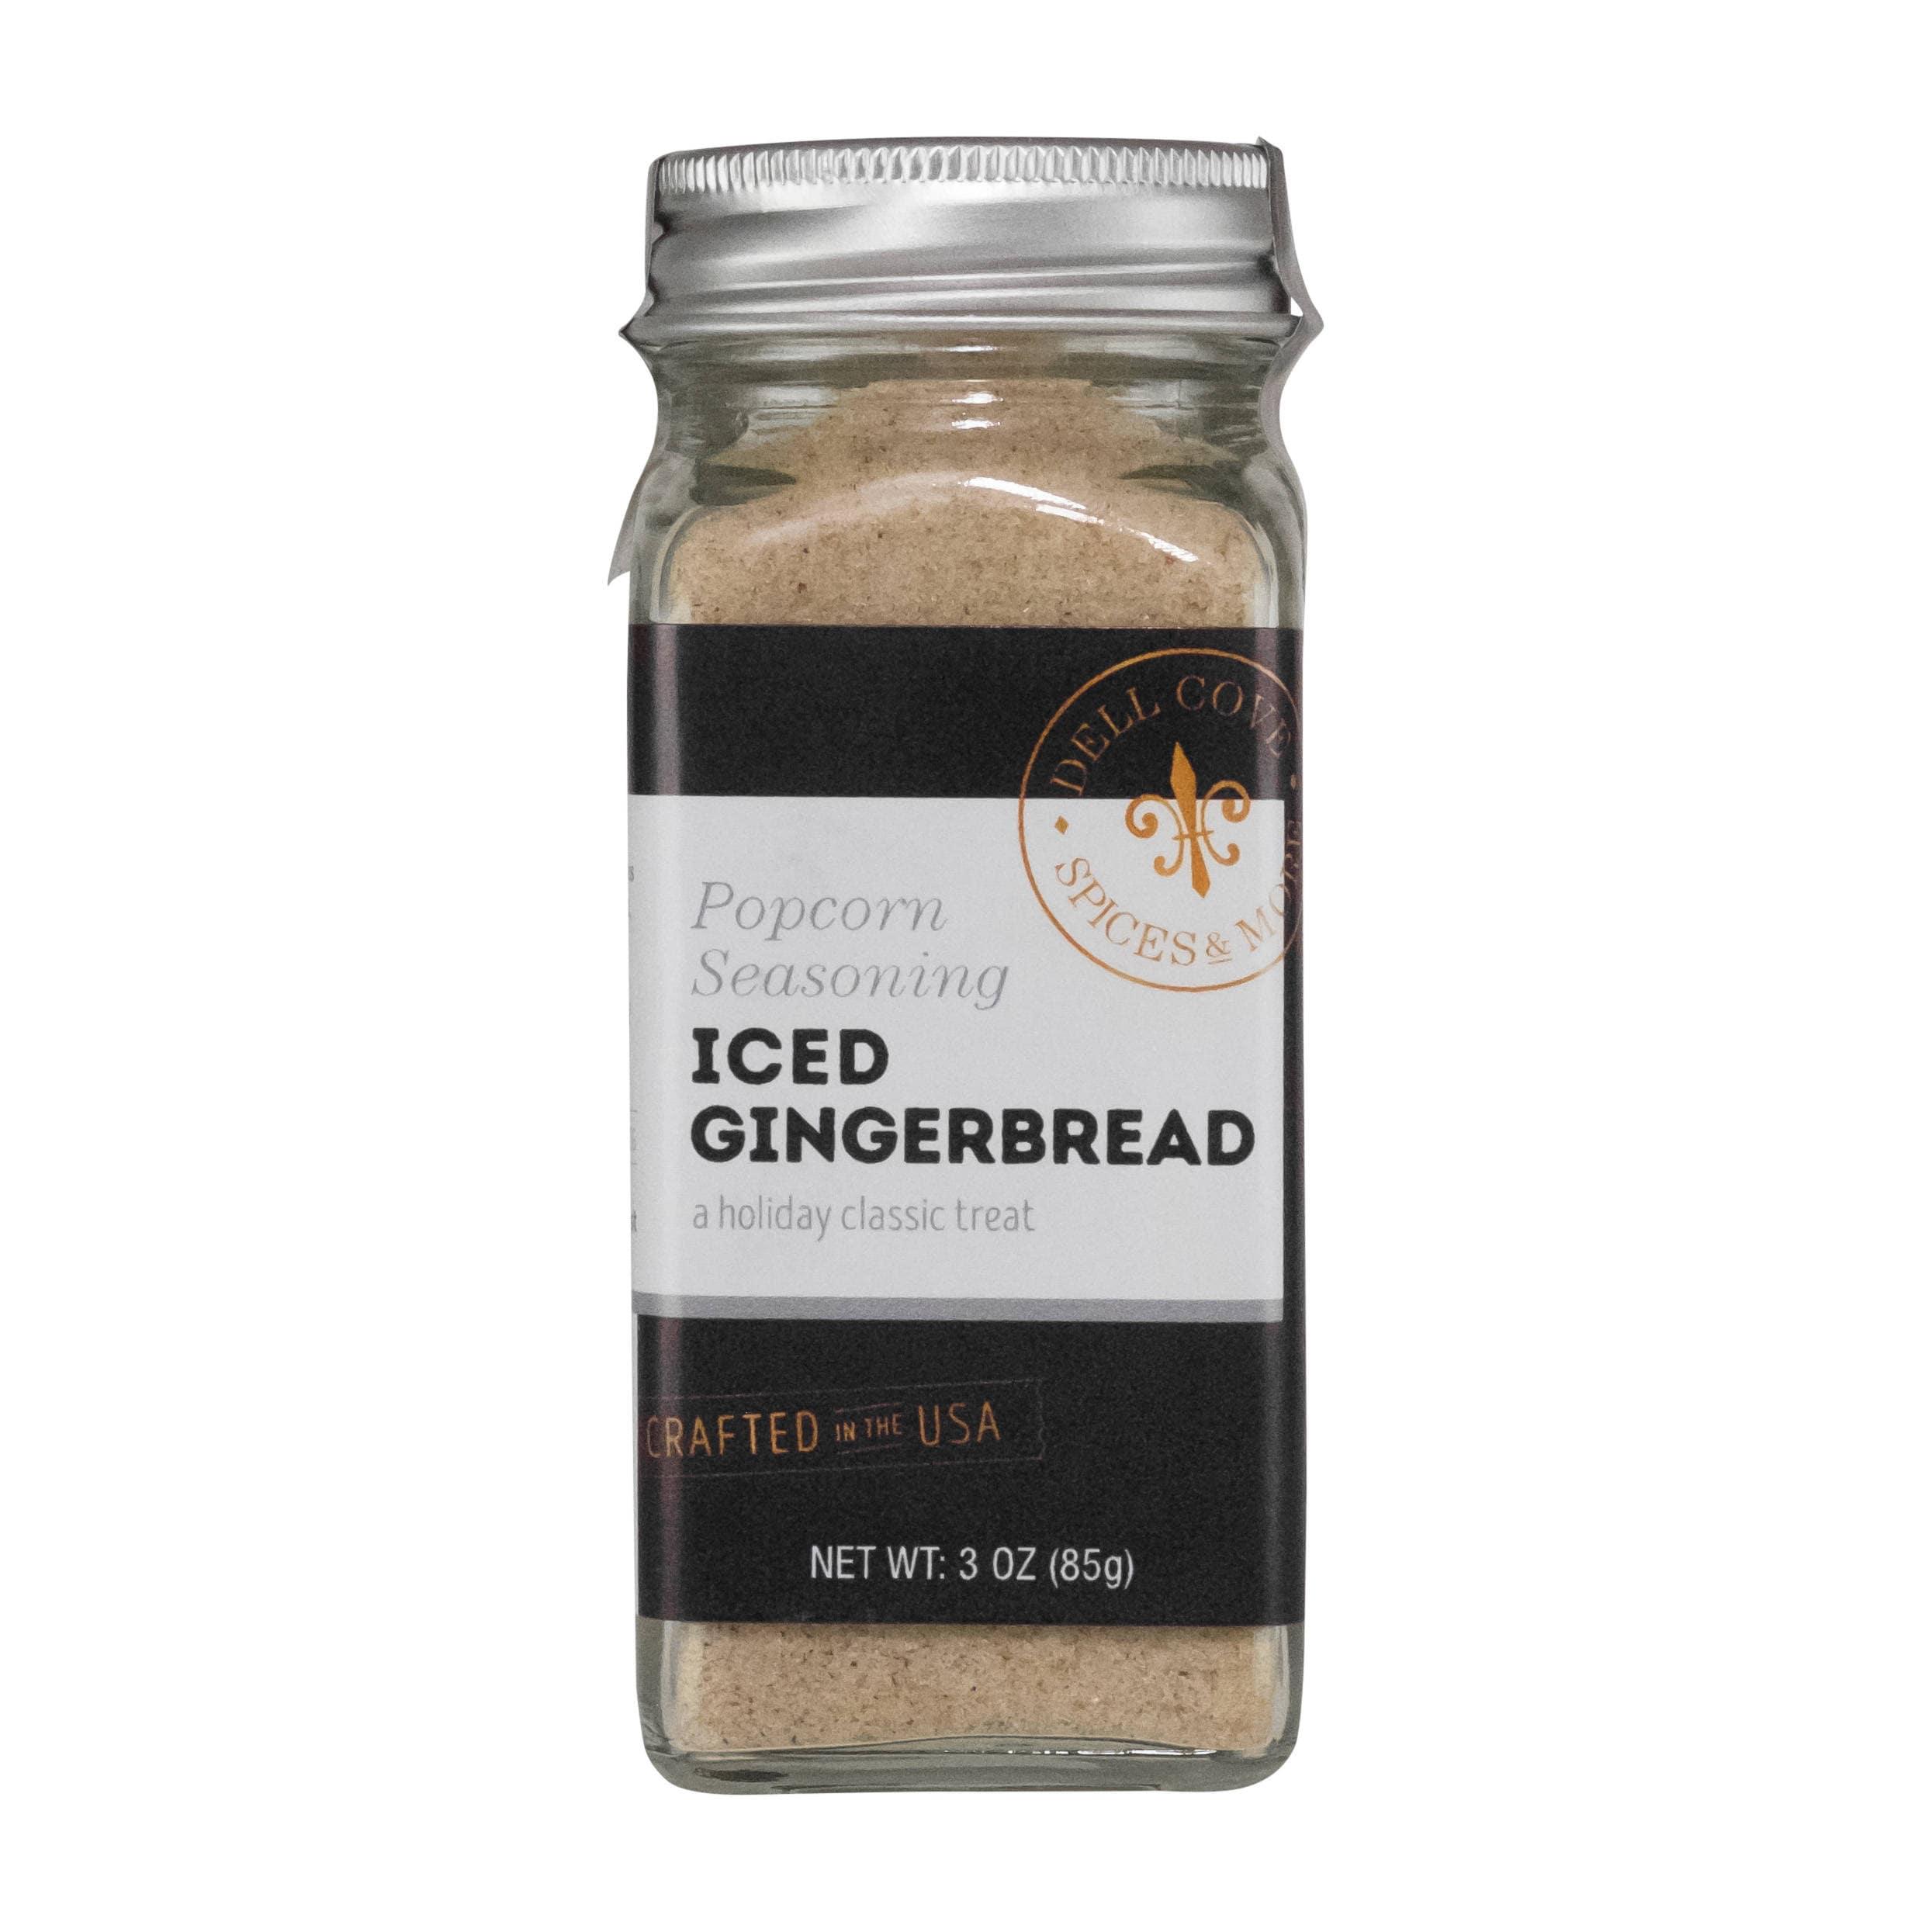 Iced Gingerbread Popcorn Seasoning – Makes a Great Christmas Food Gift Idea !